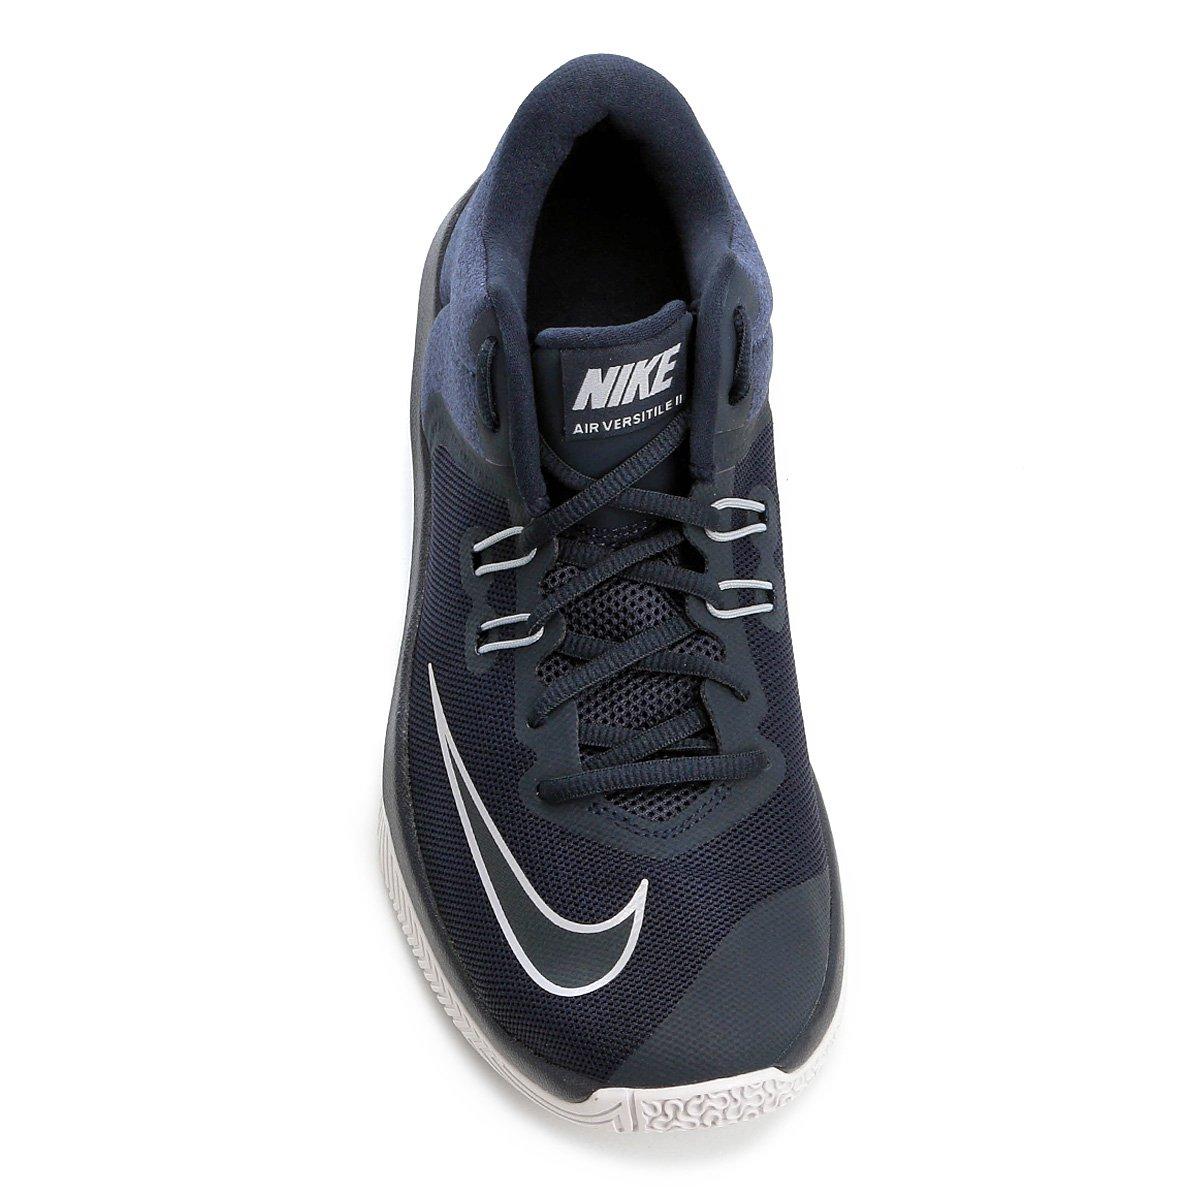 Nike Air Versitile II Air Tênis Tênis Marinho Nike Masculino PvxRnTq15w